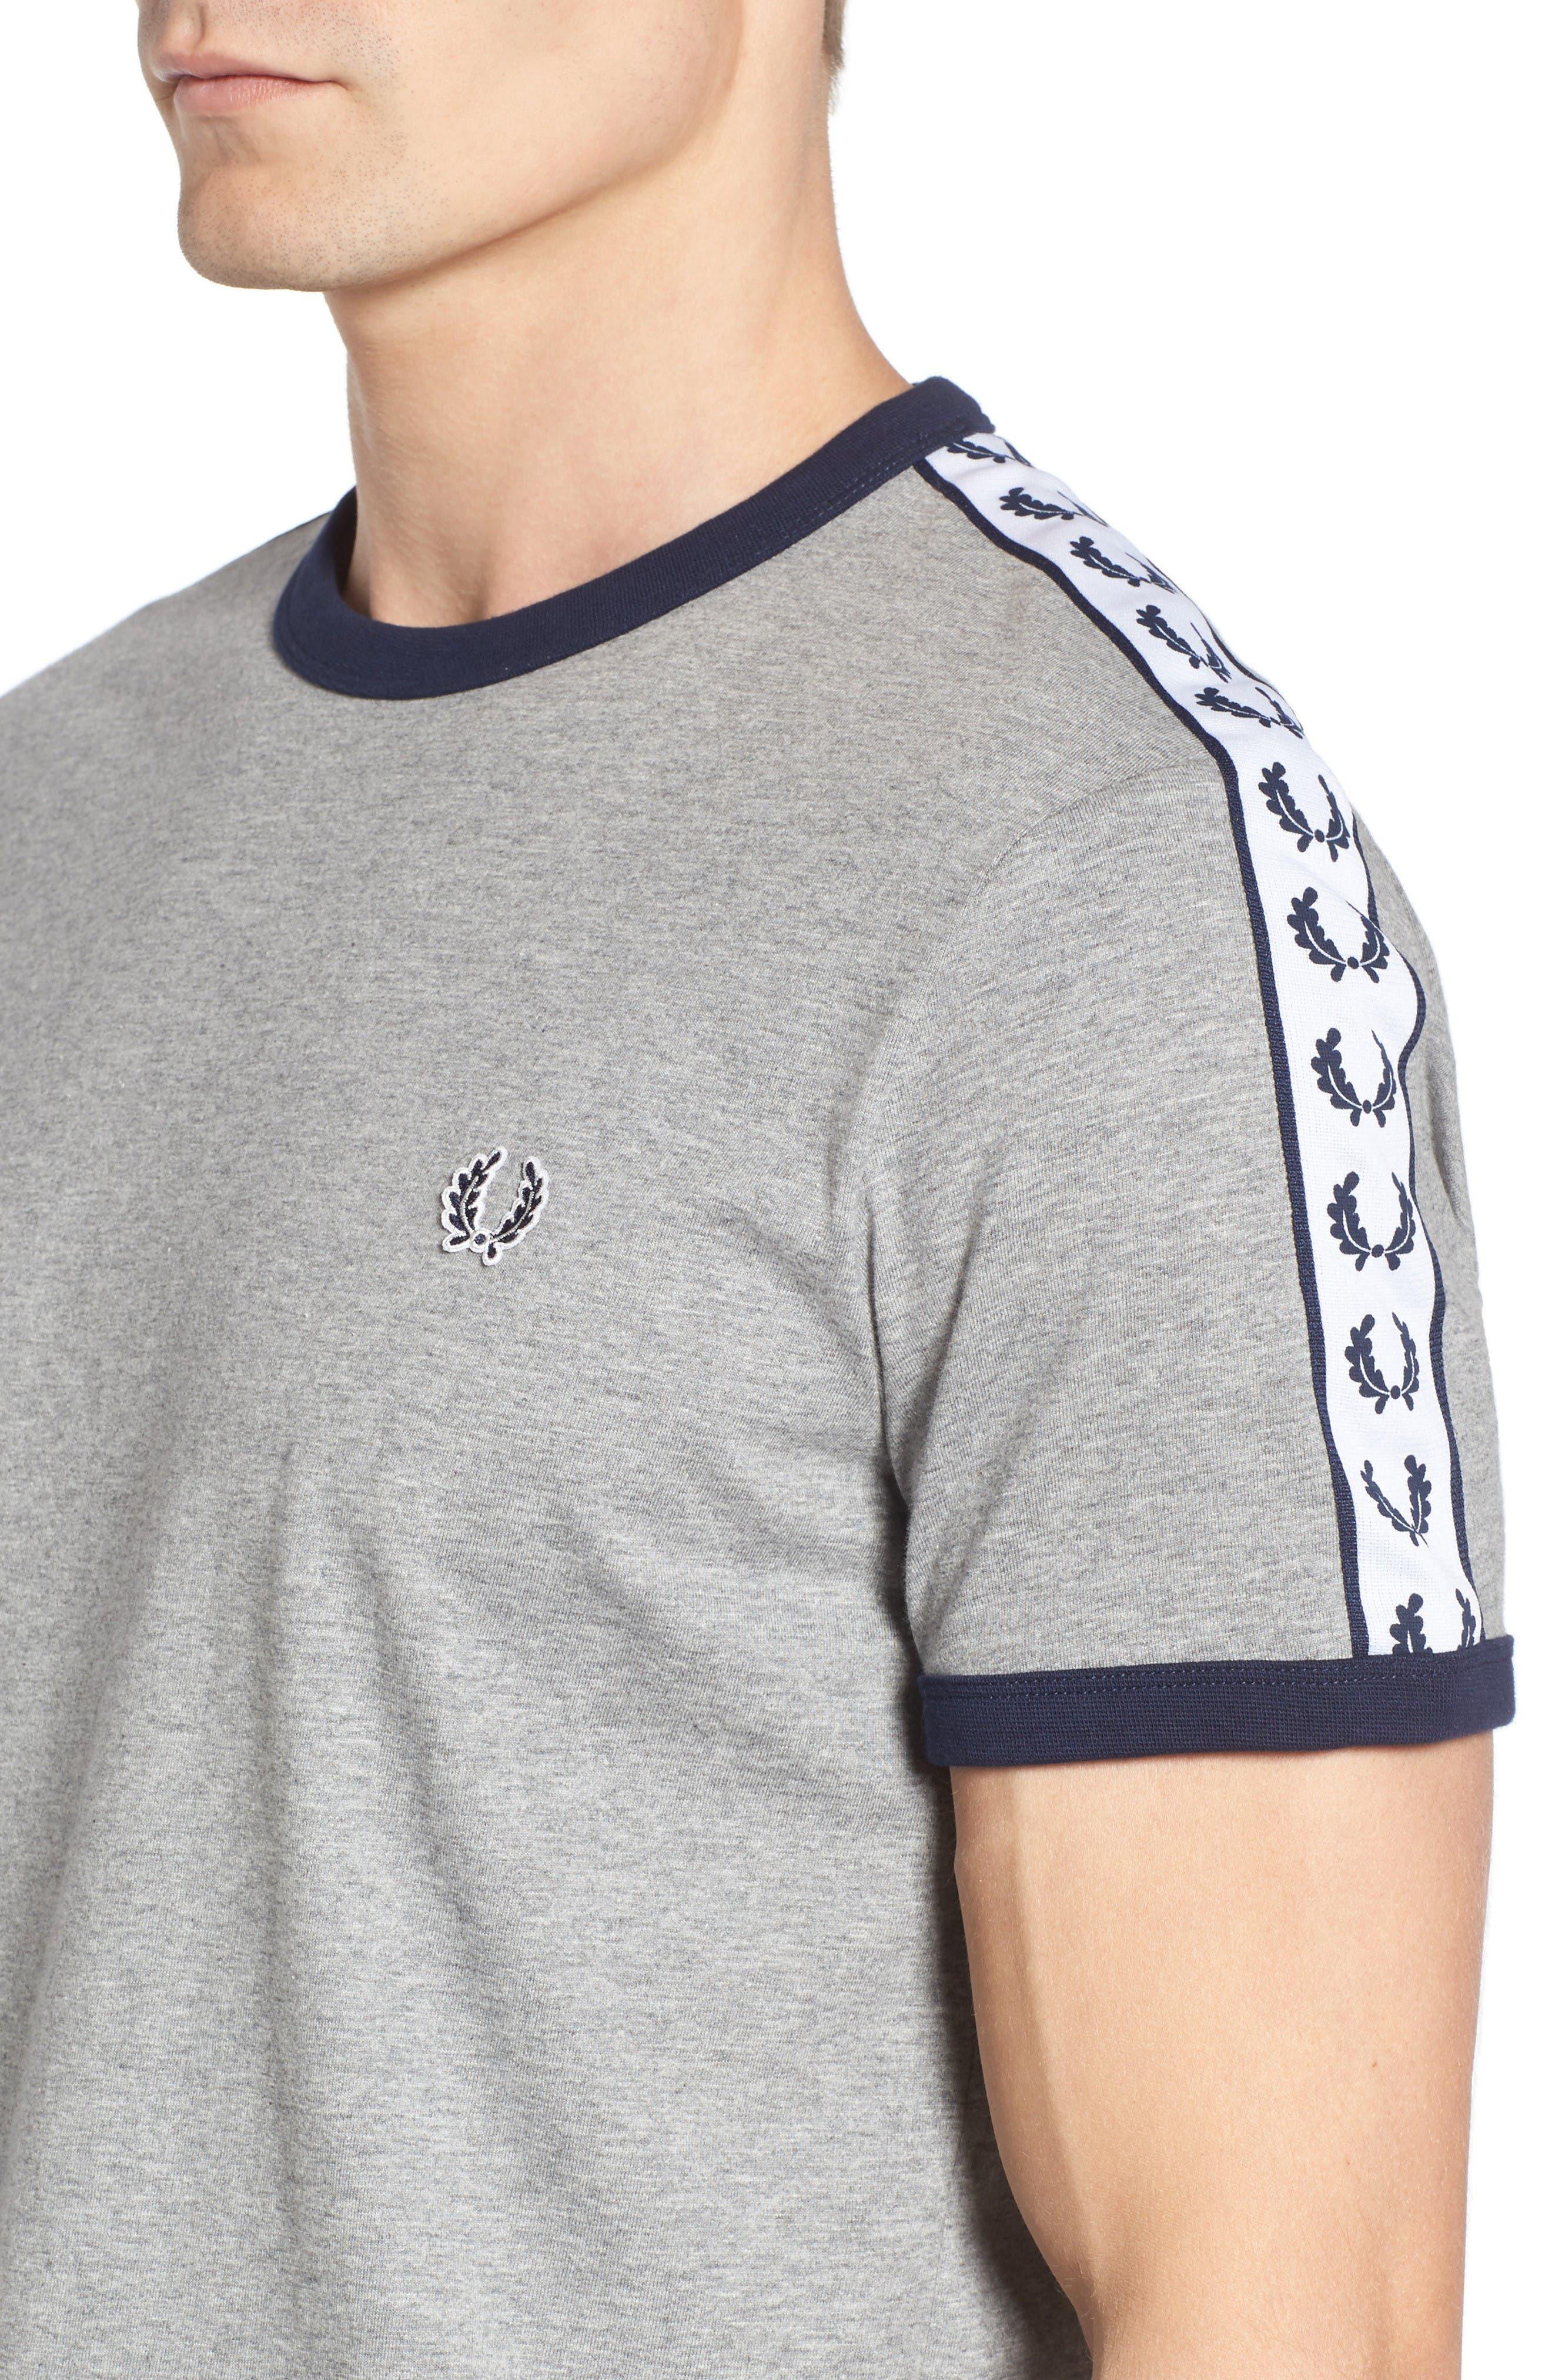 Extra Trim Fit Cotton Ringer T-Shirt,                             Alternate thumbnail 4, color,                             Steel Marl